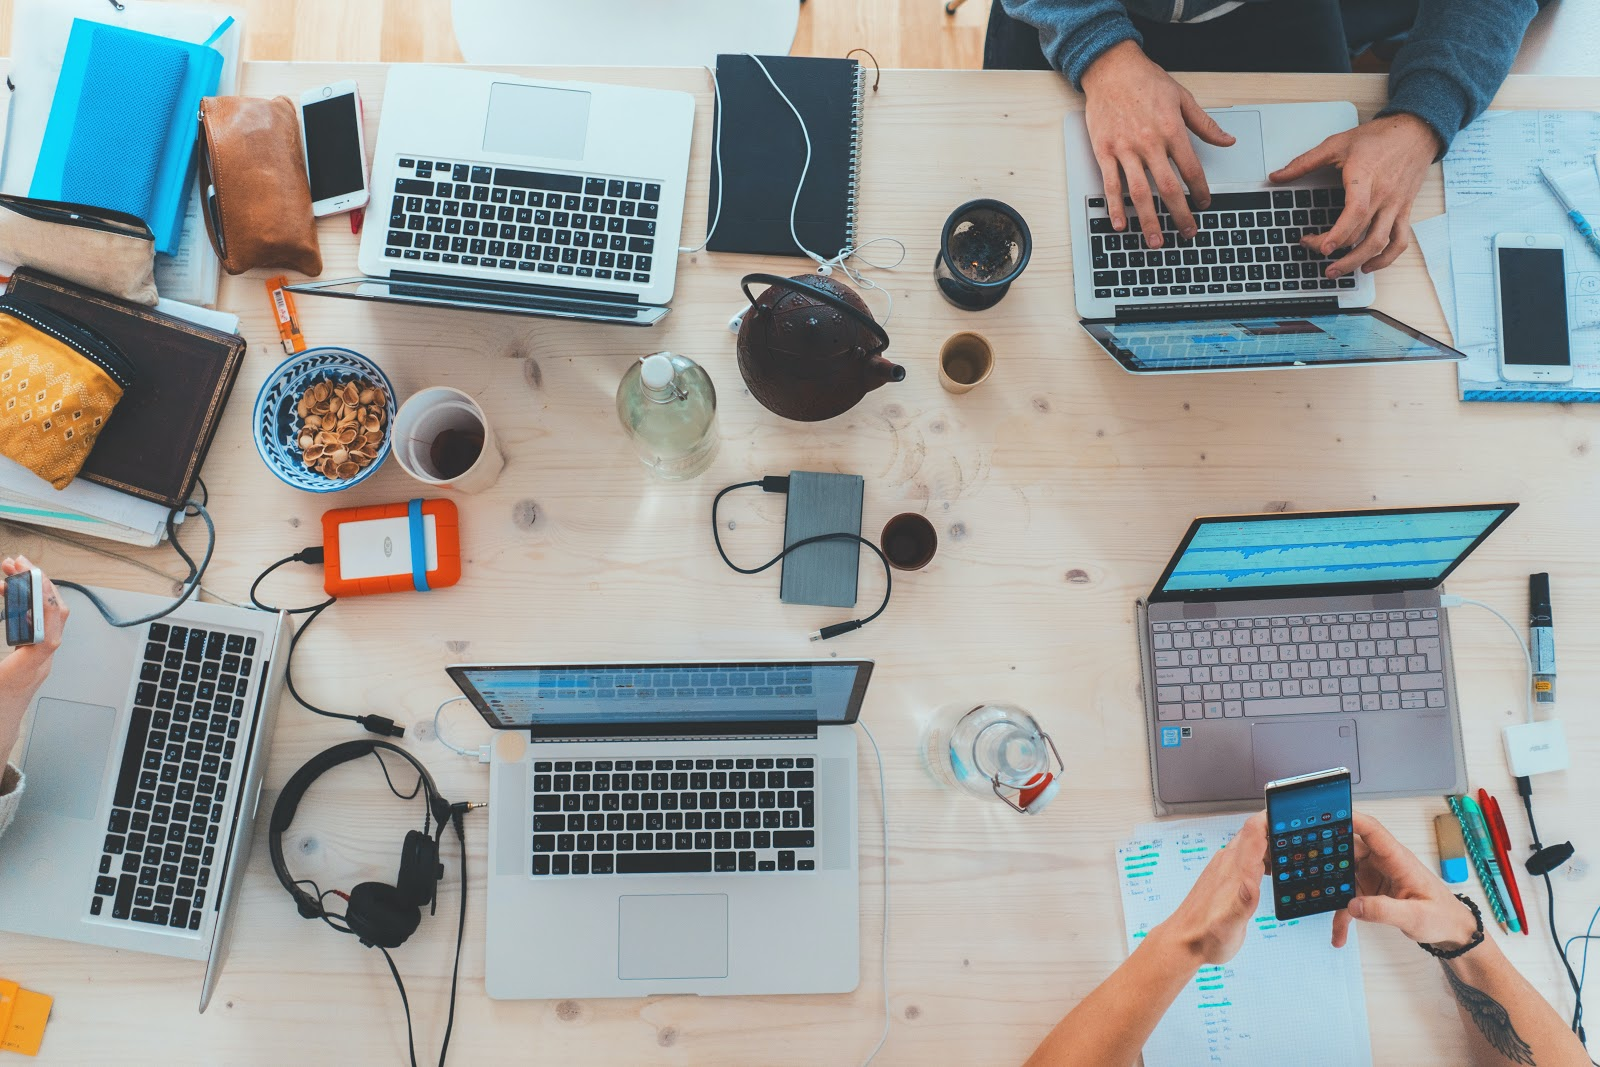 software for technicians, helpdesk